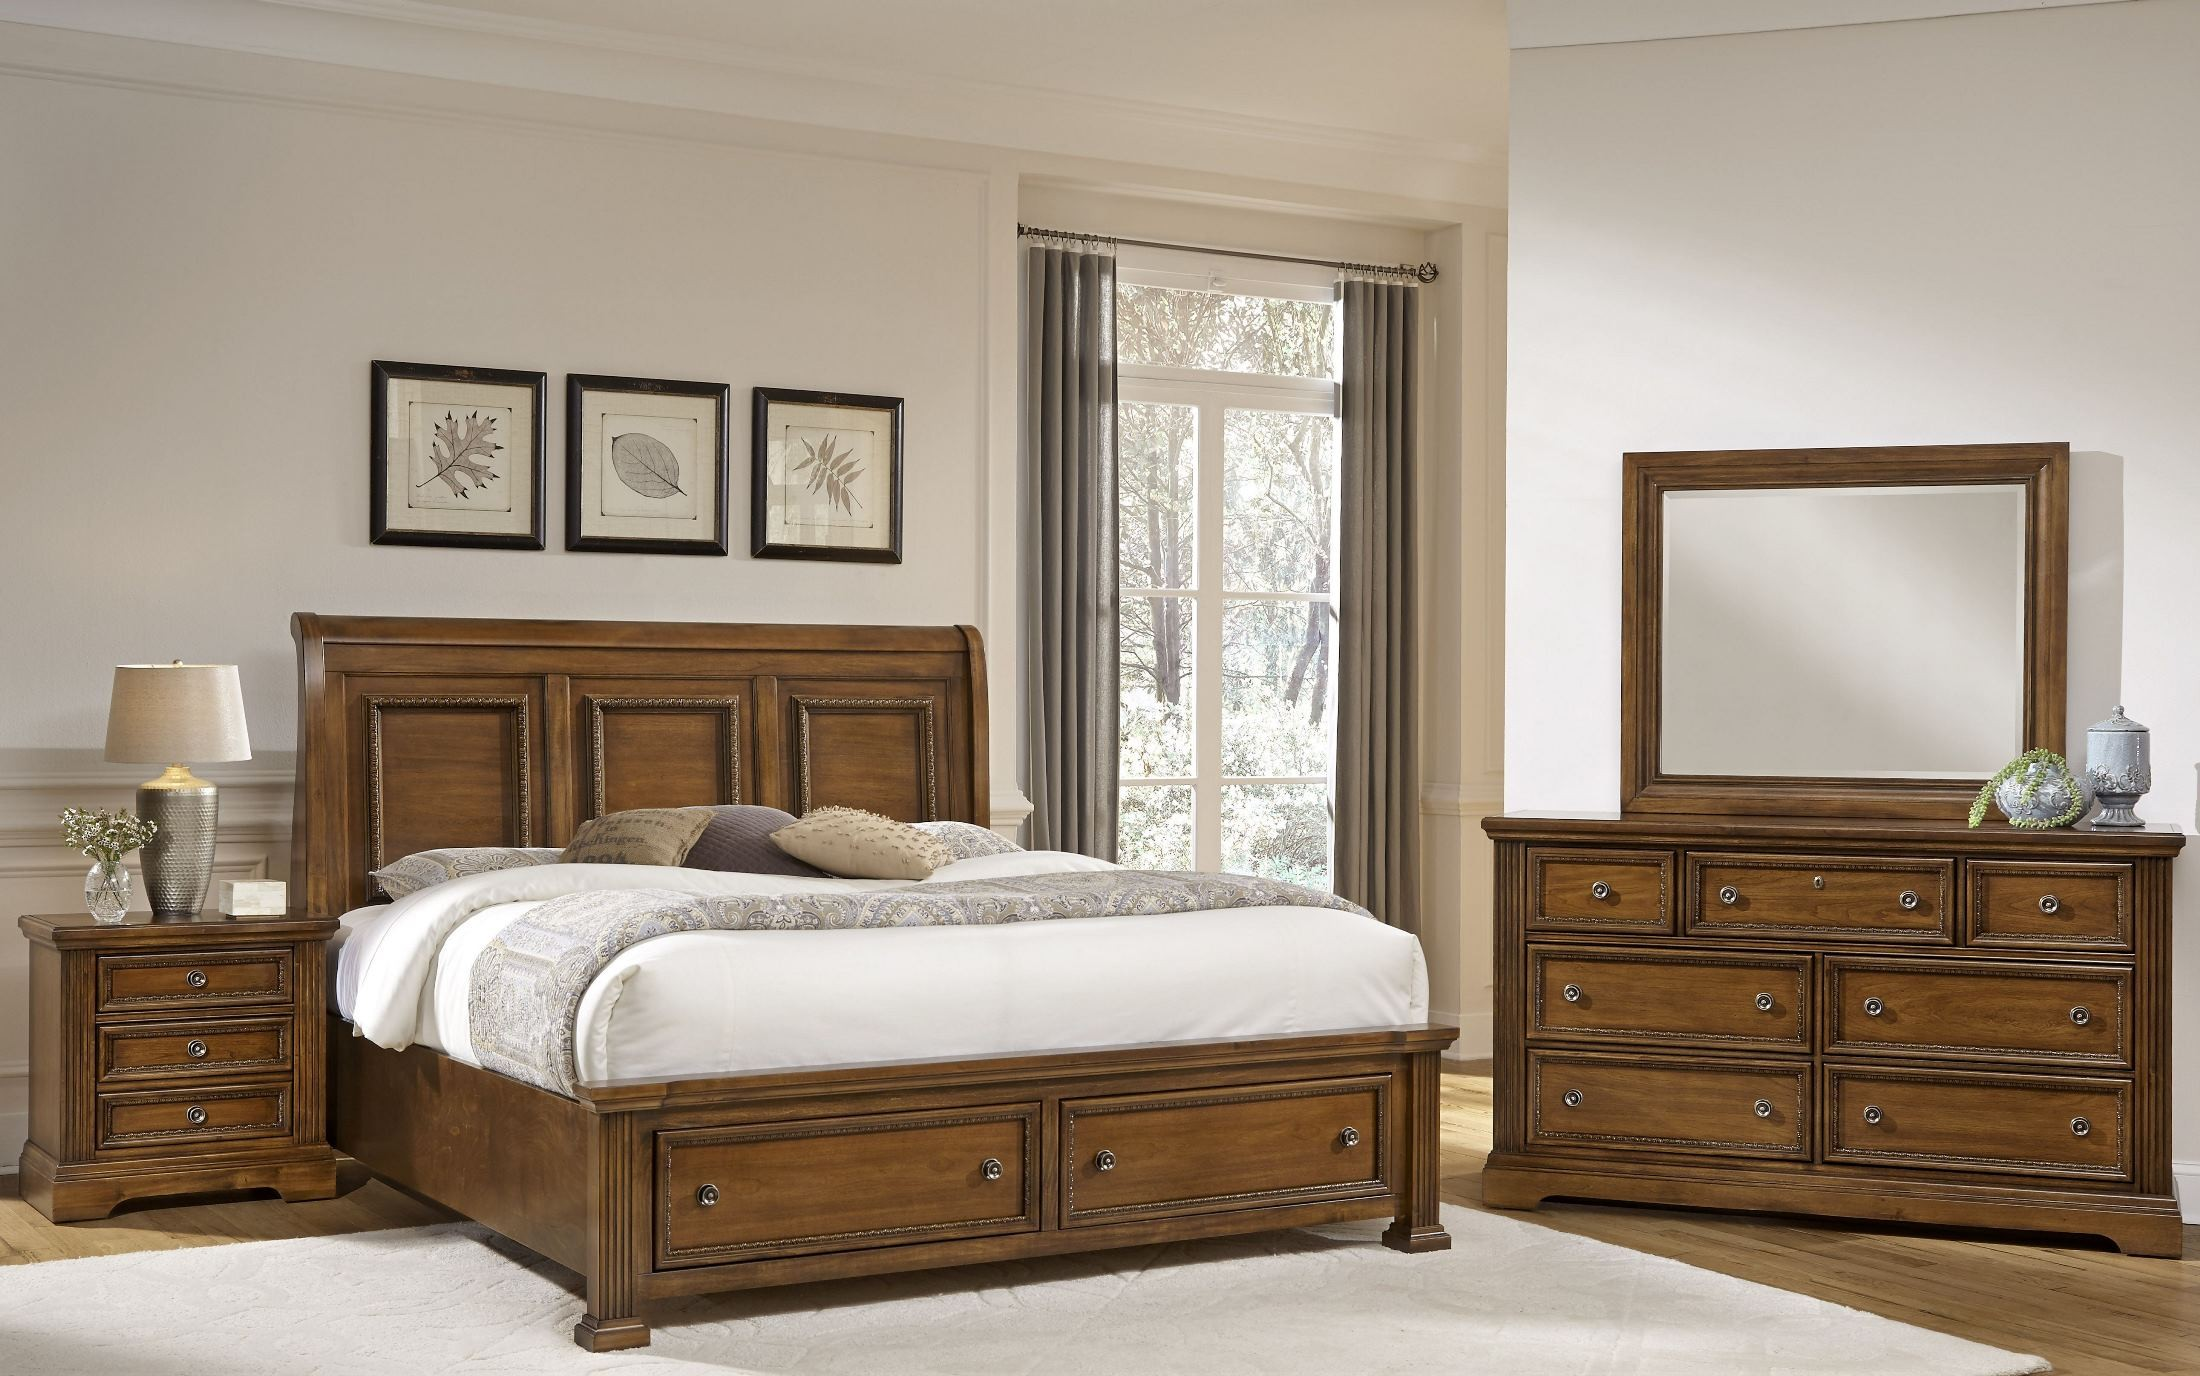 Affinity Antique Cherry Sleigh Storage Bedroom Set 562 553 050b 502 555t Vaughan Bassett